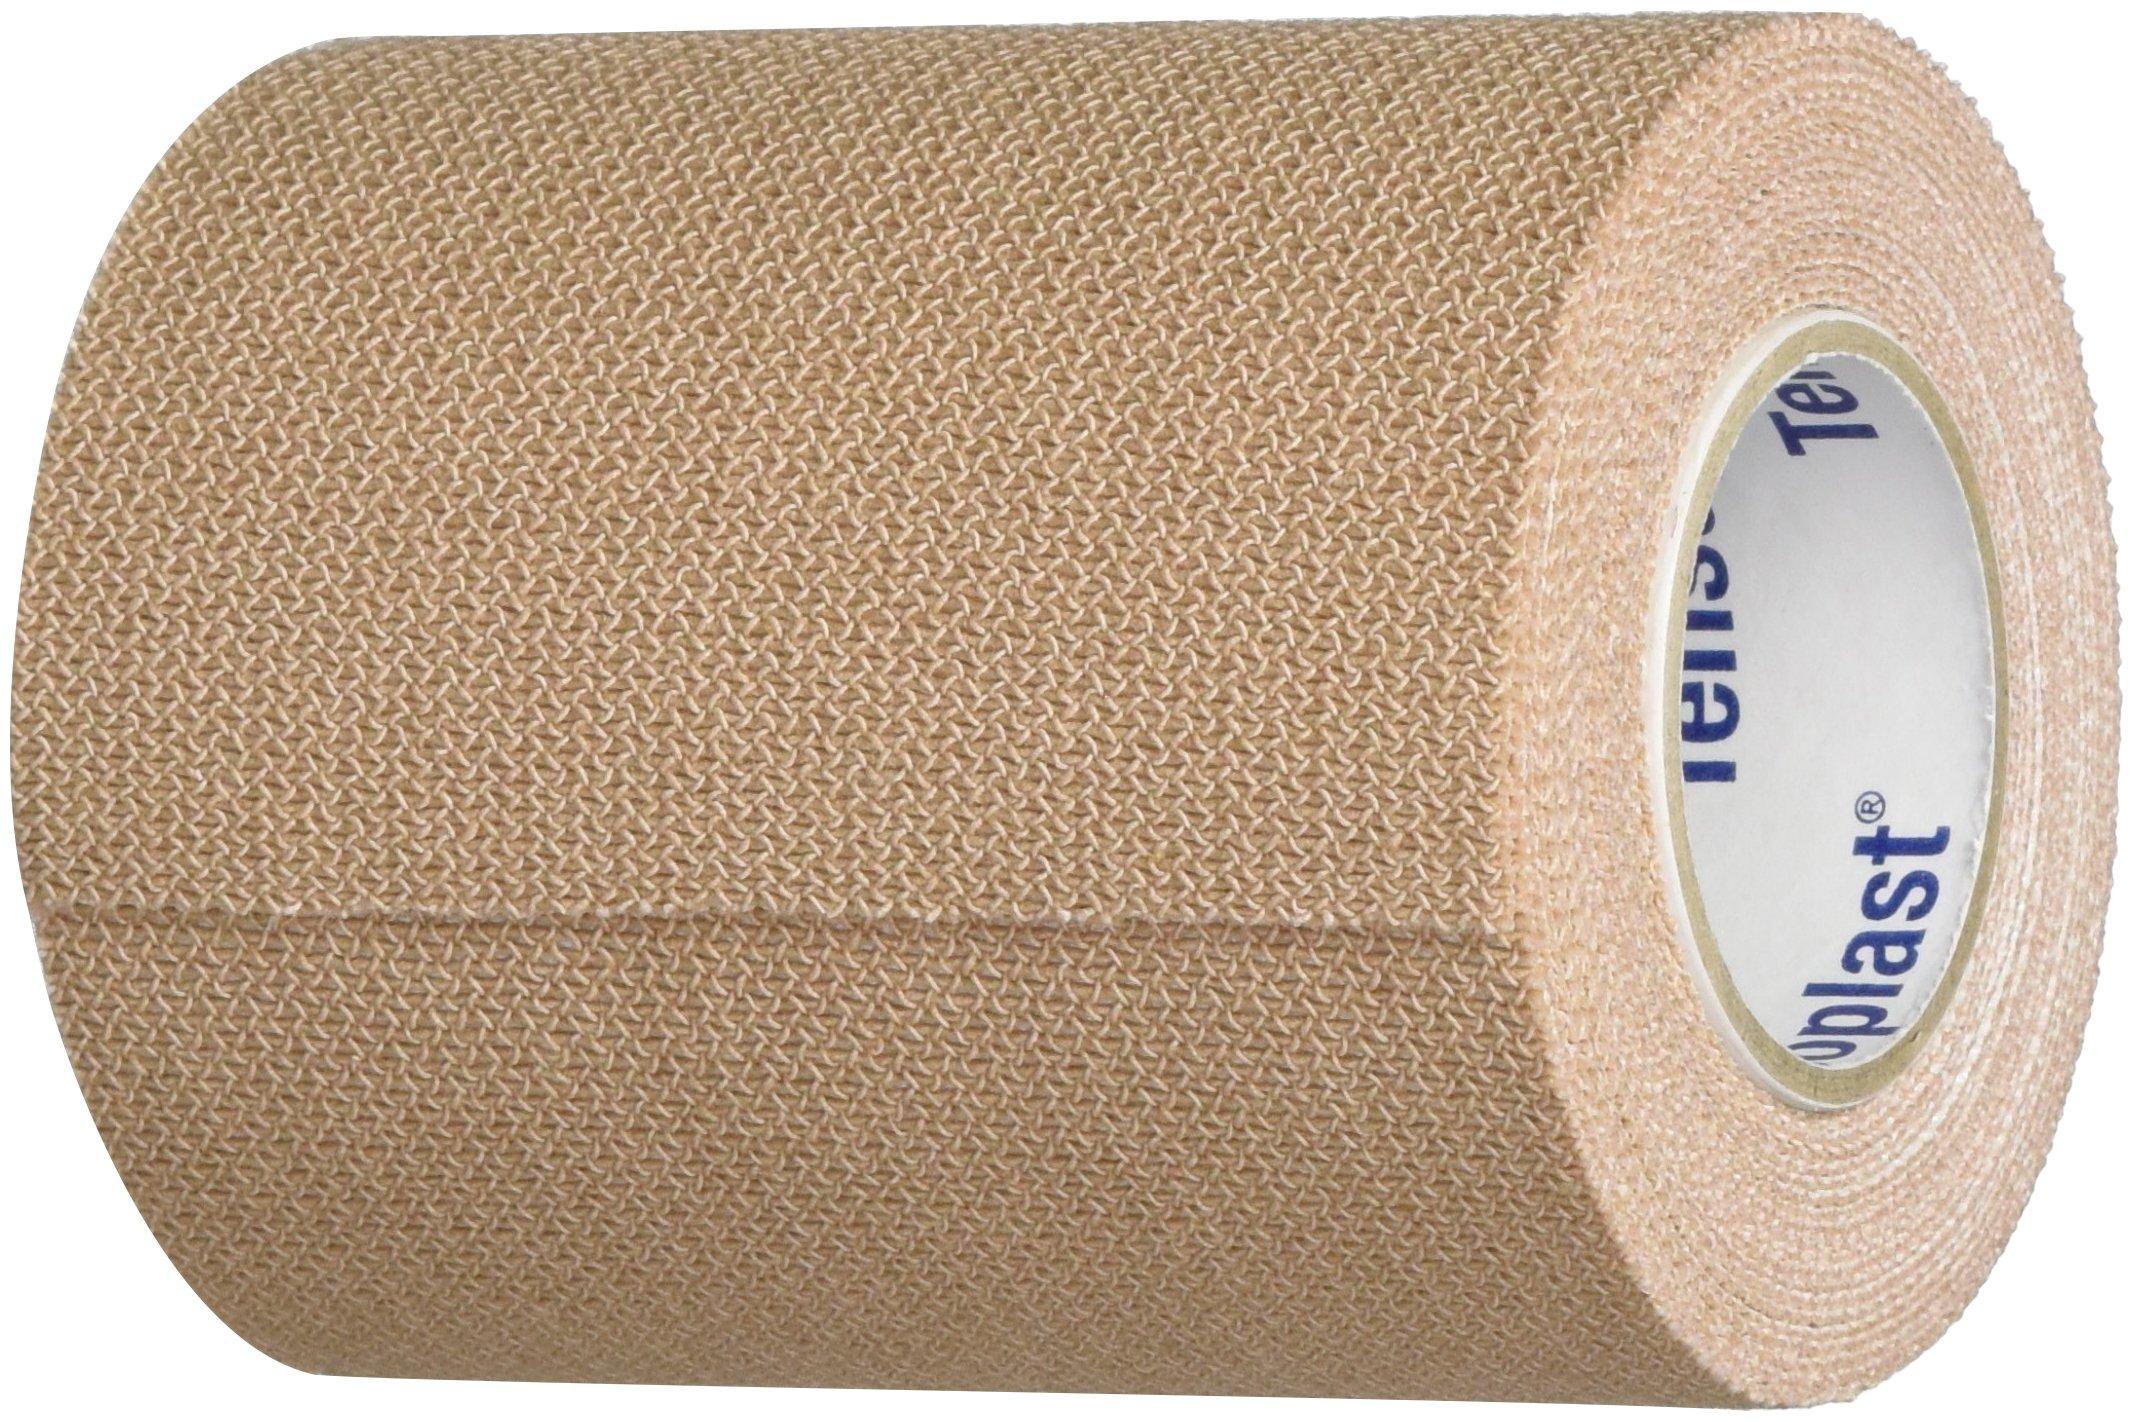 Tensoplast Elastic Athletic Tape, 3'' x 5 Yards, Tan Pack of 4 by BSN Medical